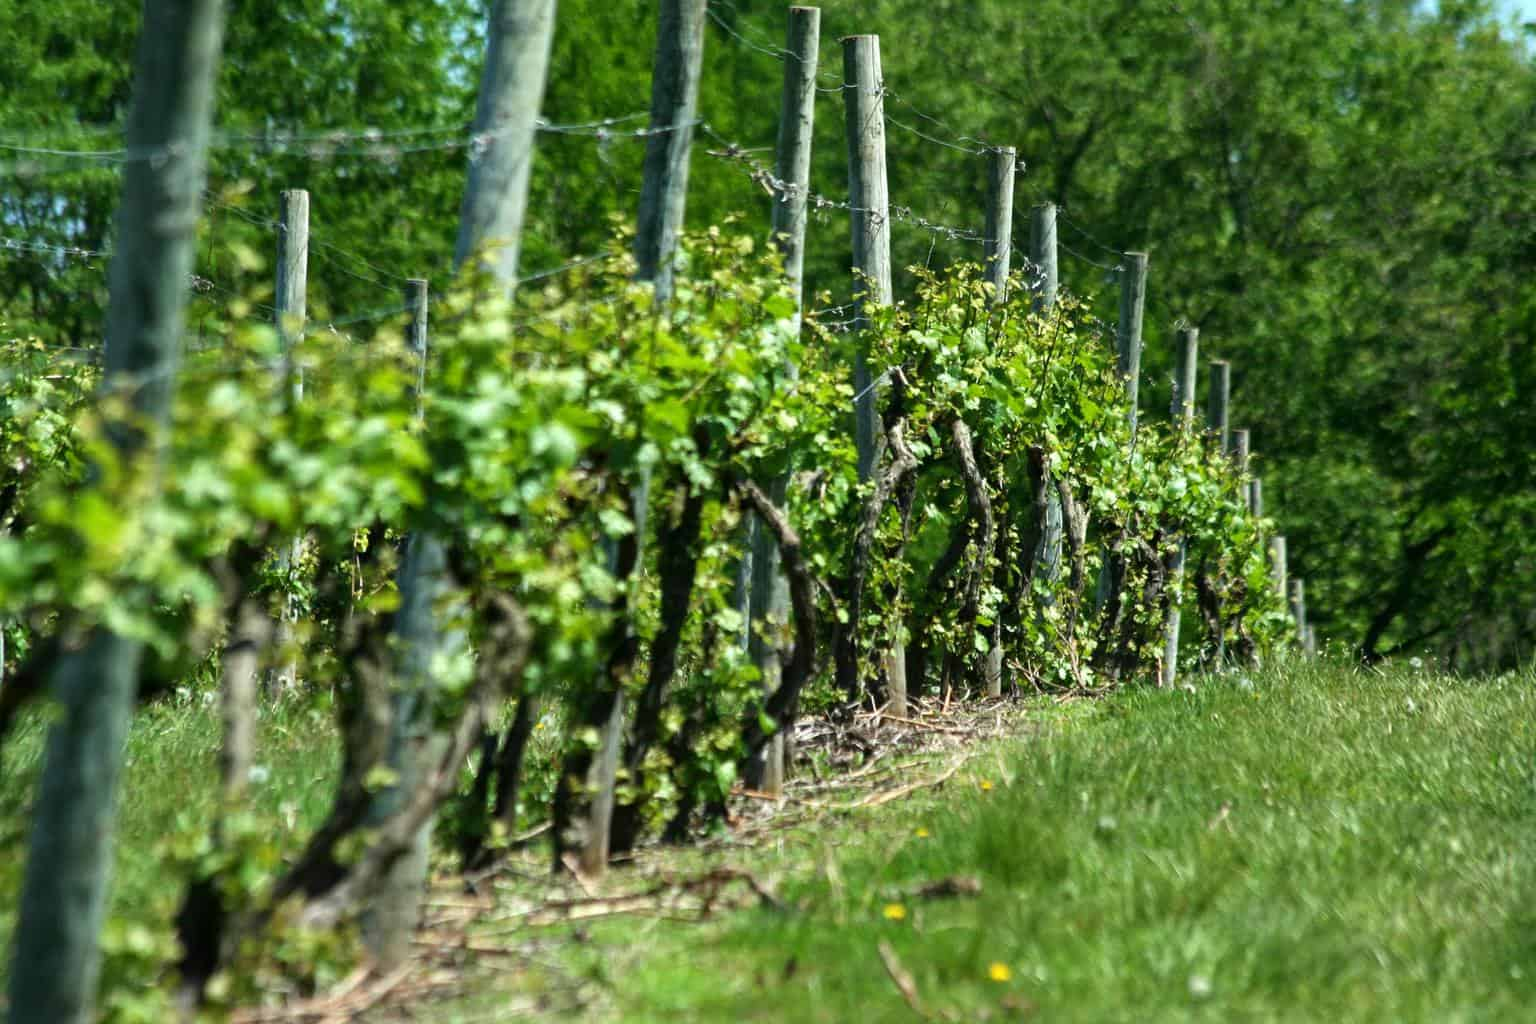 15 Sturdy Grape Vine Trellis Design Ideas For Your ...